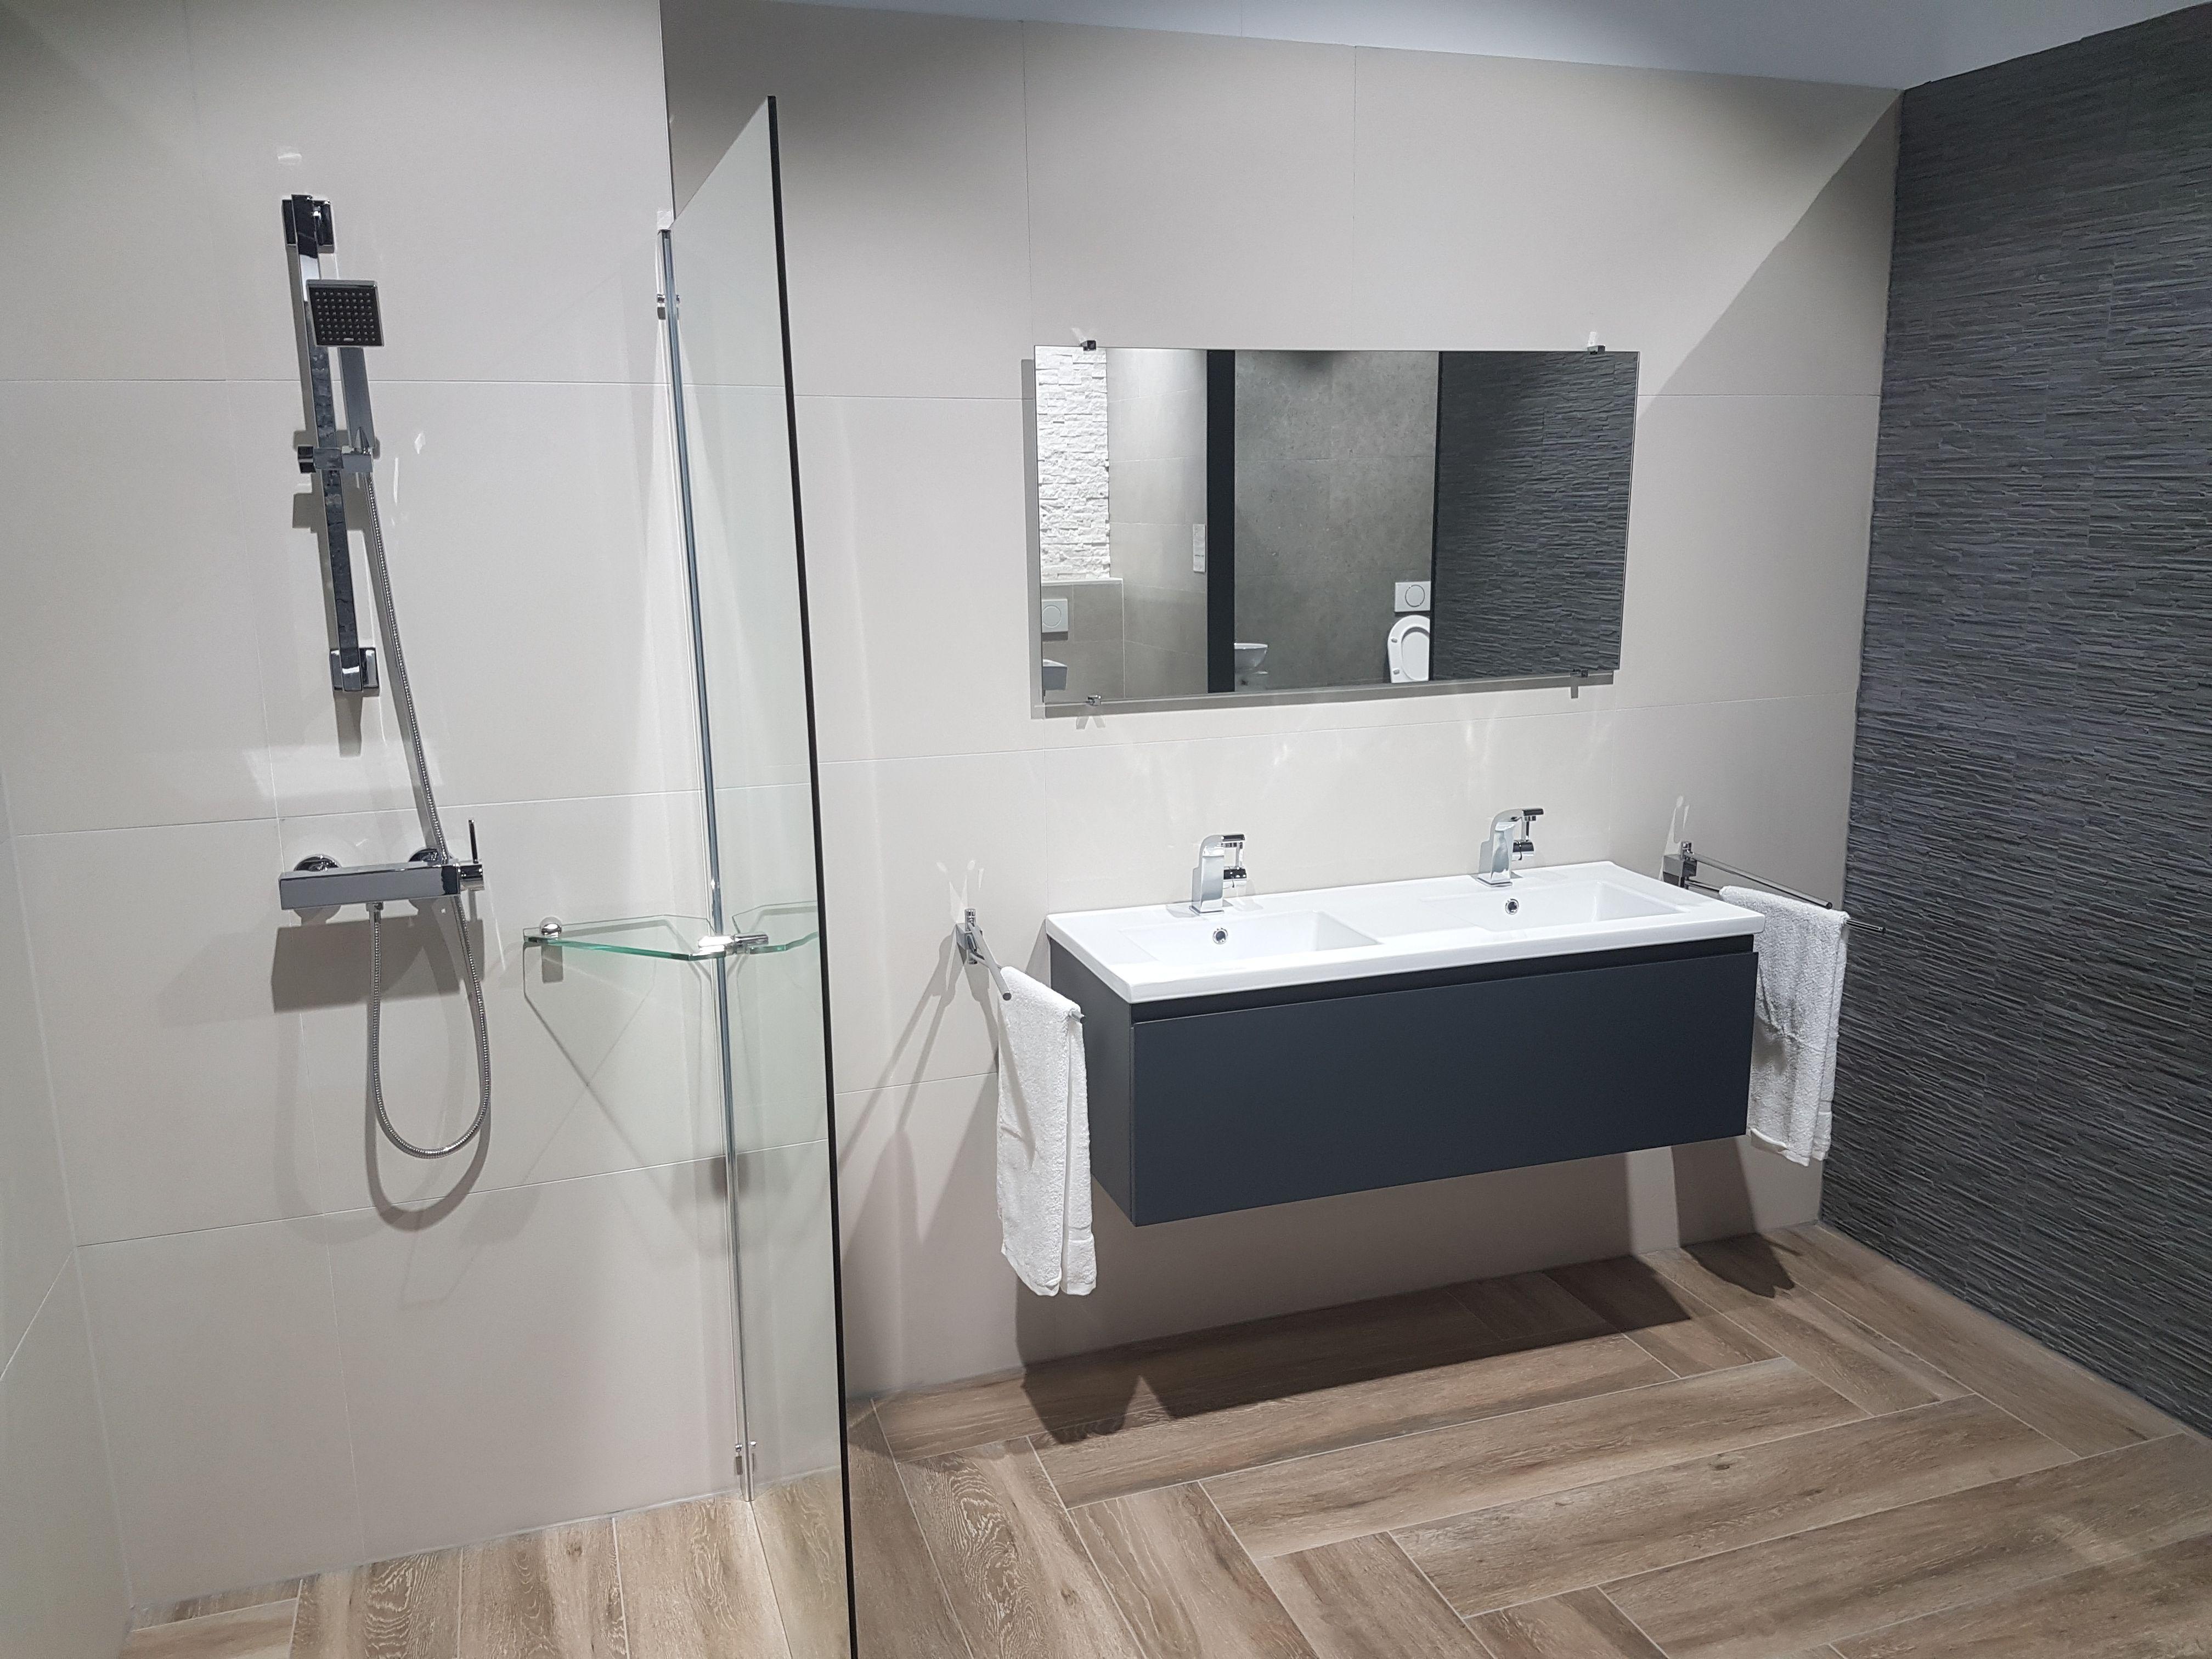 33 best Landelijke badkamers images on Pinterest | Bathroom ...